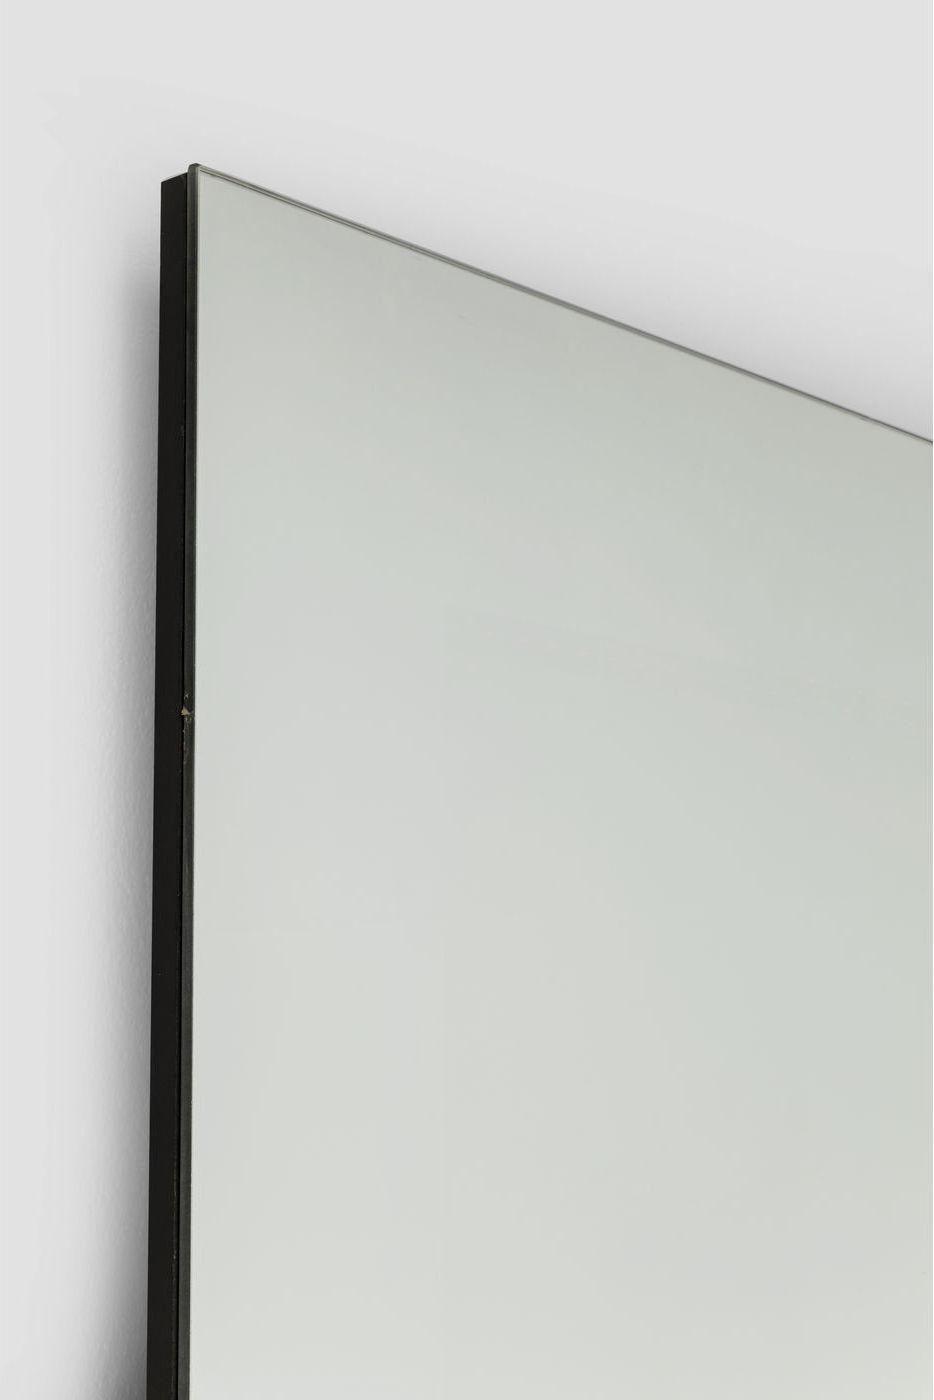 kare design spiegel infinity 120x80cm led colore meubelen verlichting. Black Bedroom Furniture Sets. Home Design Ideas